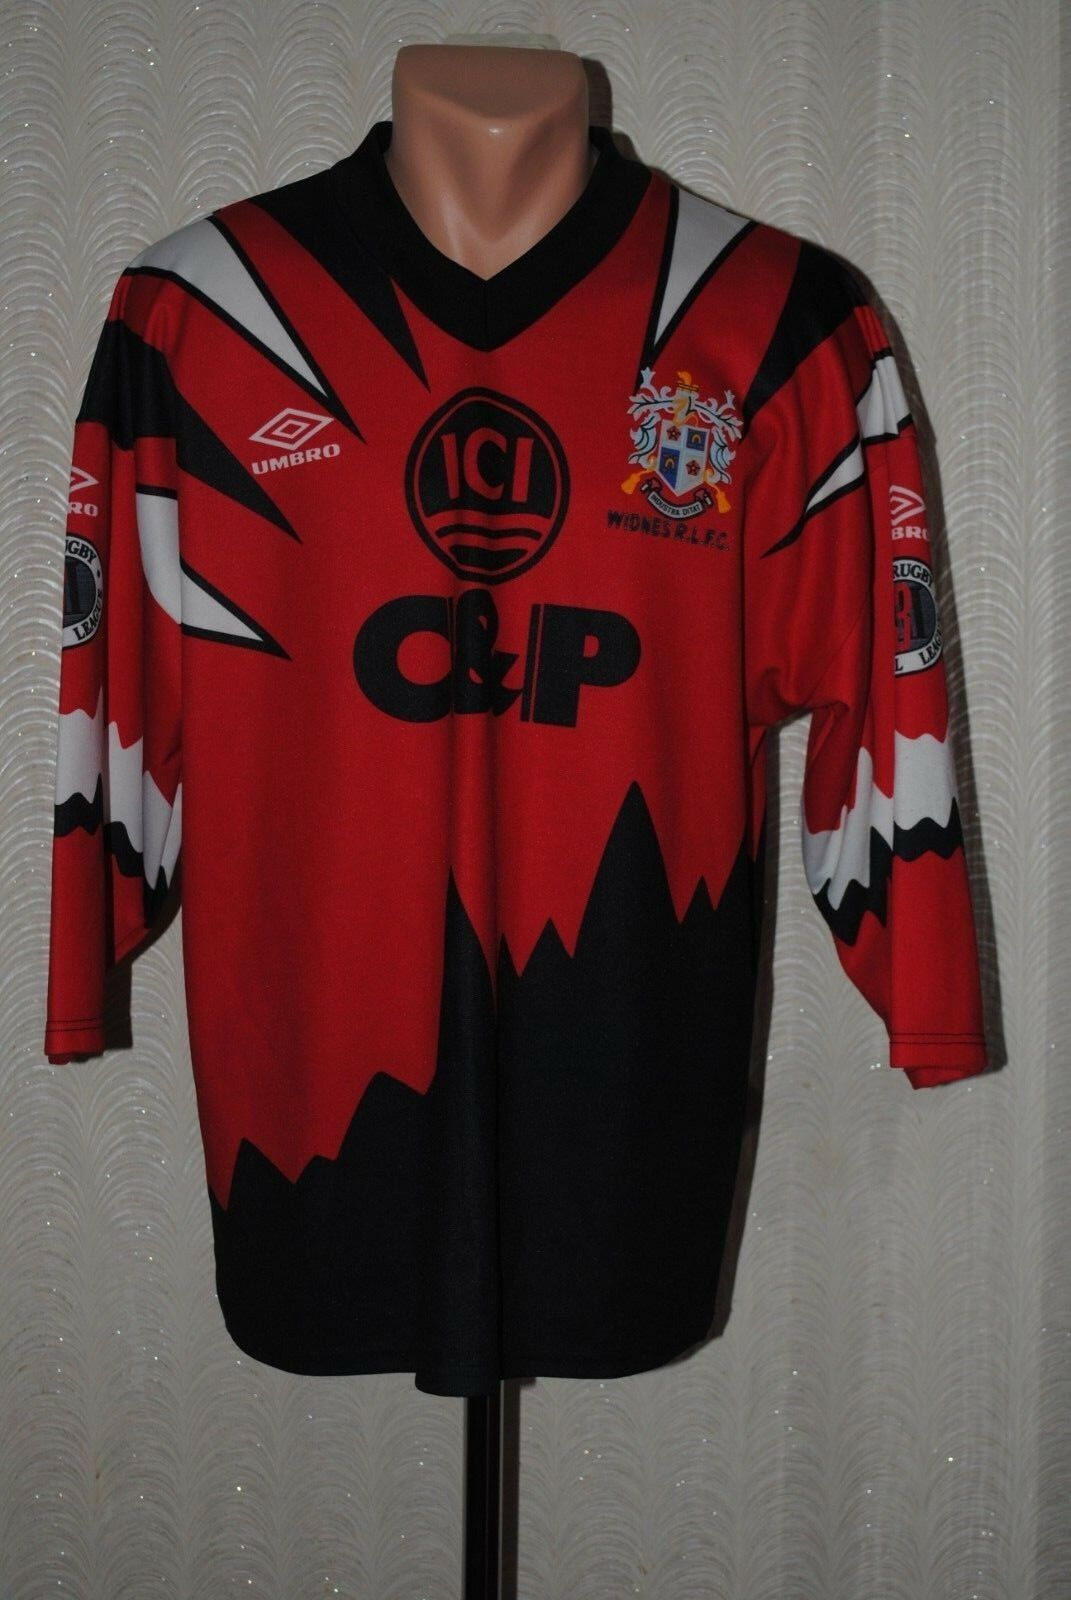 Shirt Umbro Rugby Jersey WIDNES RLFC RUFC size L Original Vintage